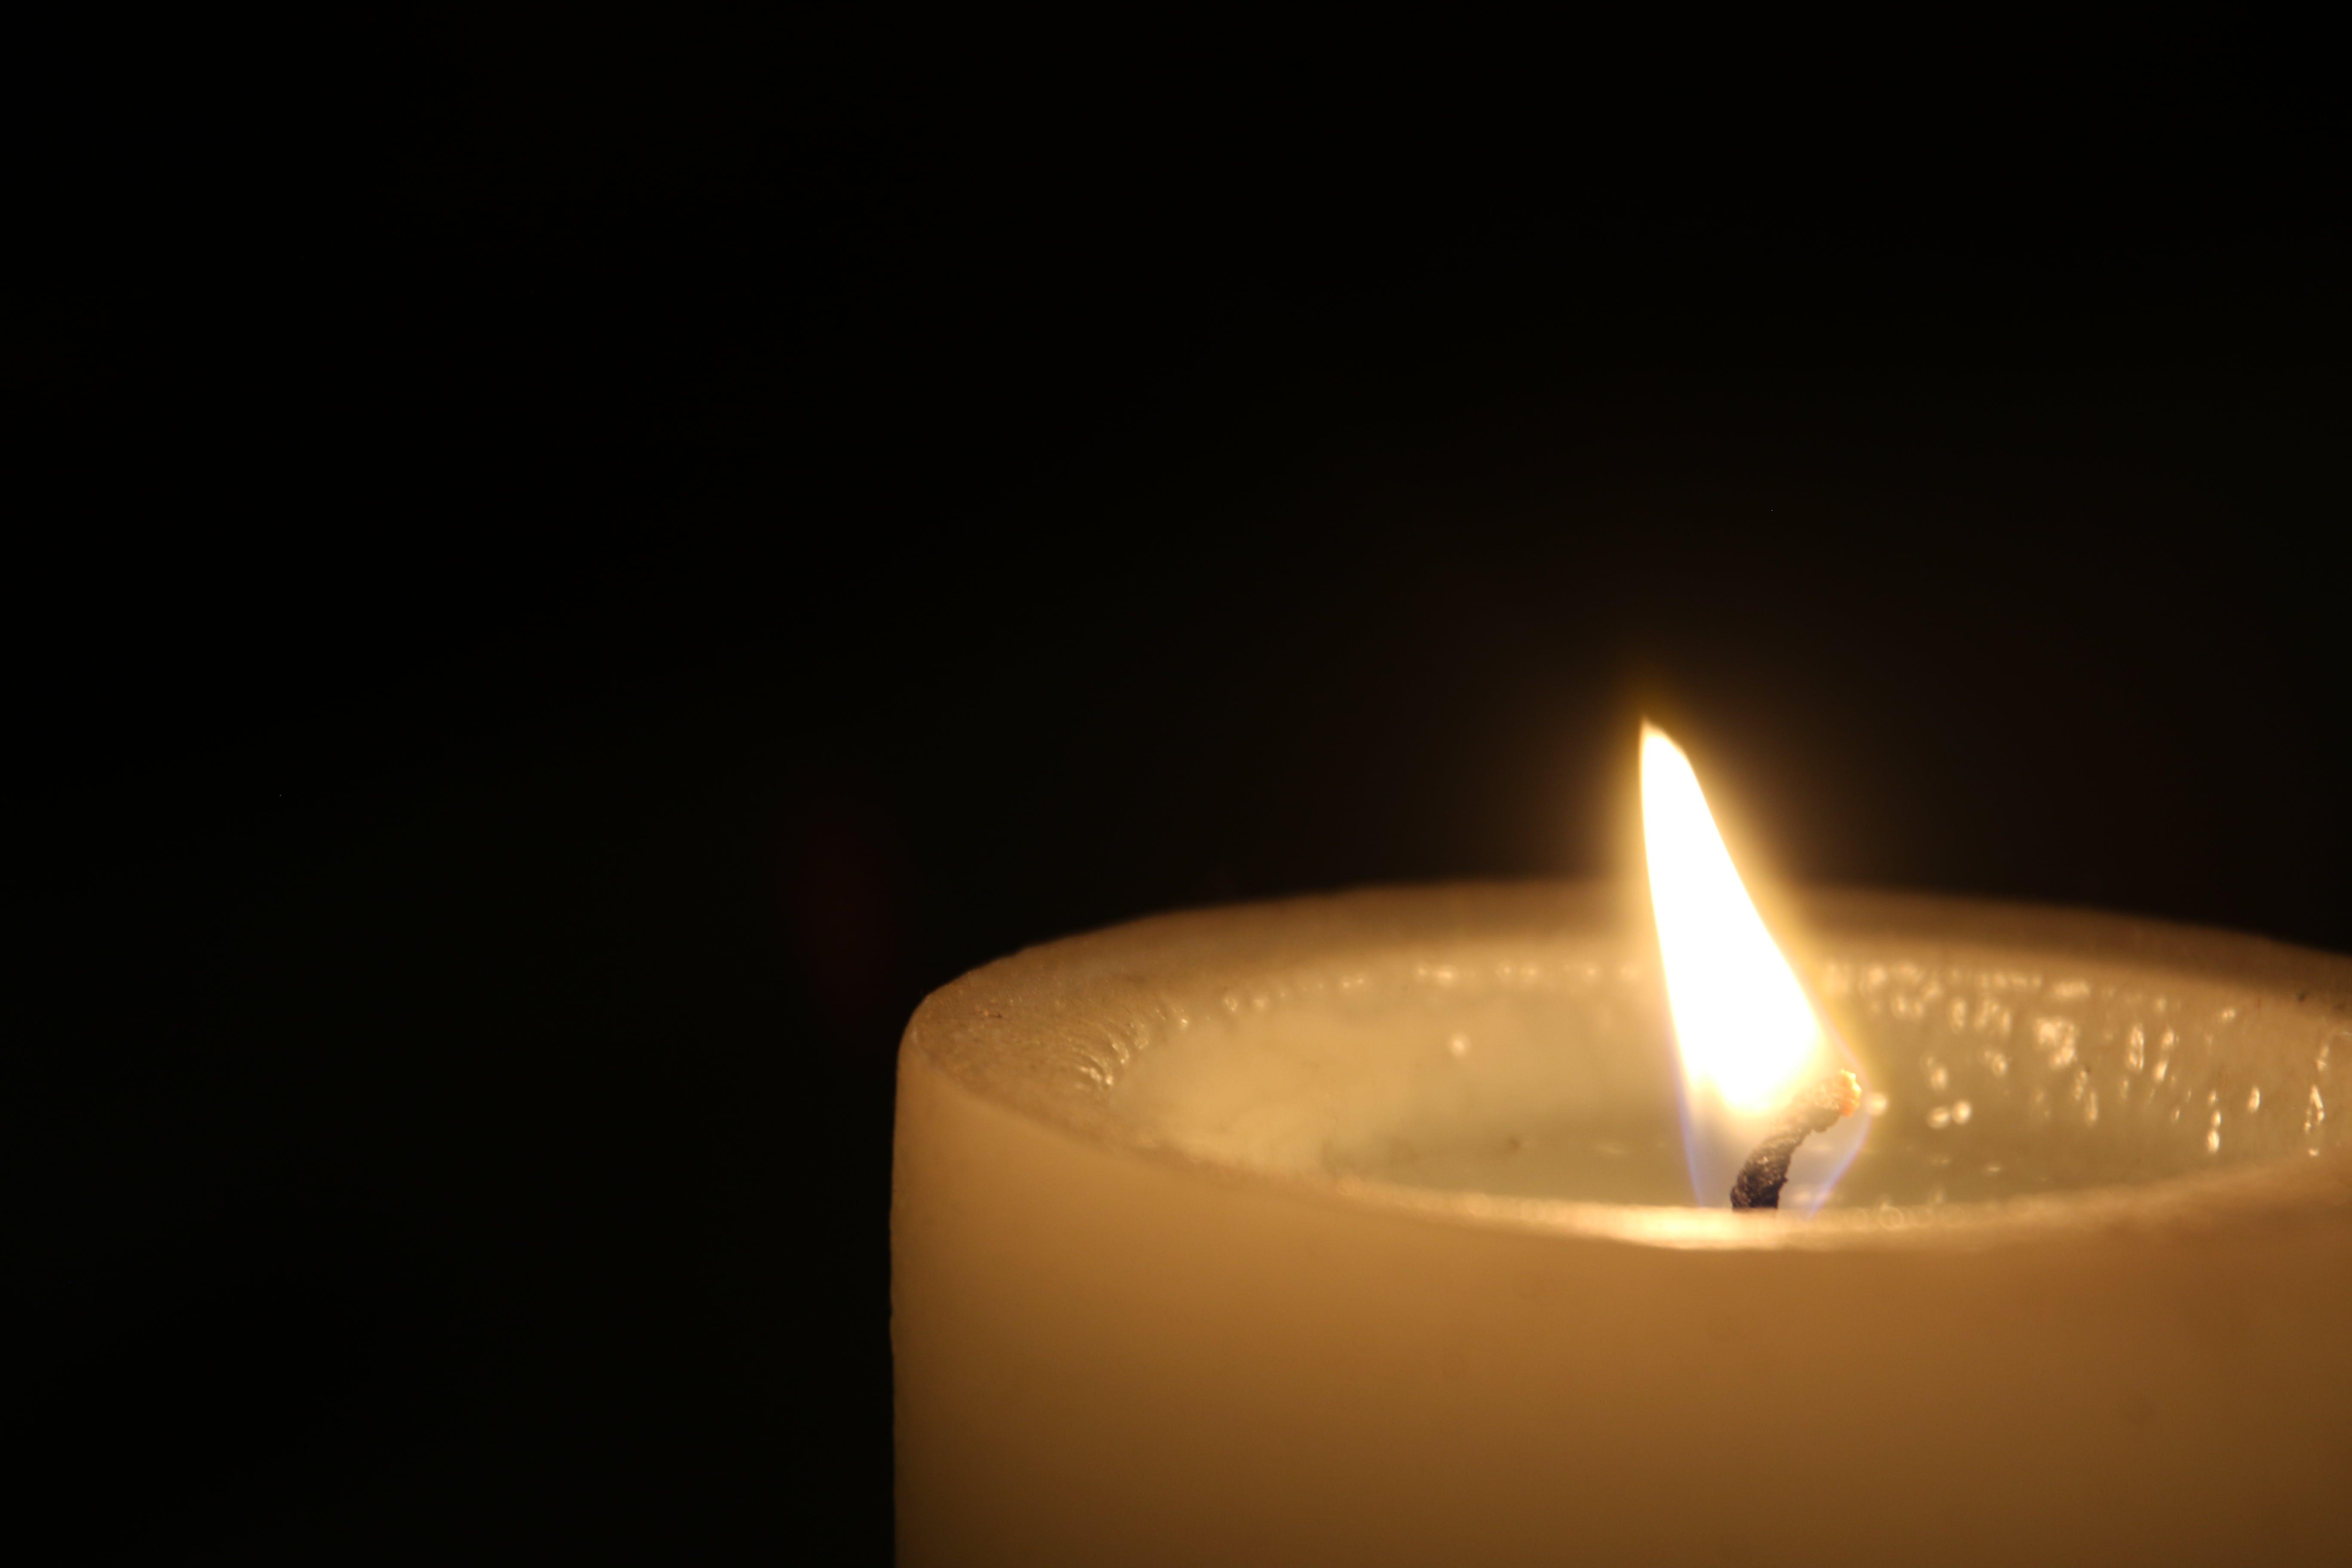 Free stock photo of light, night, romantic, date